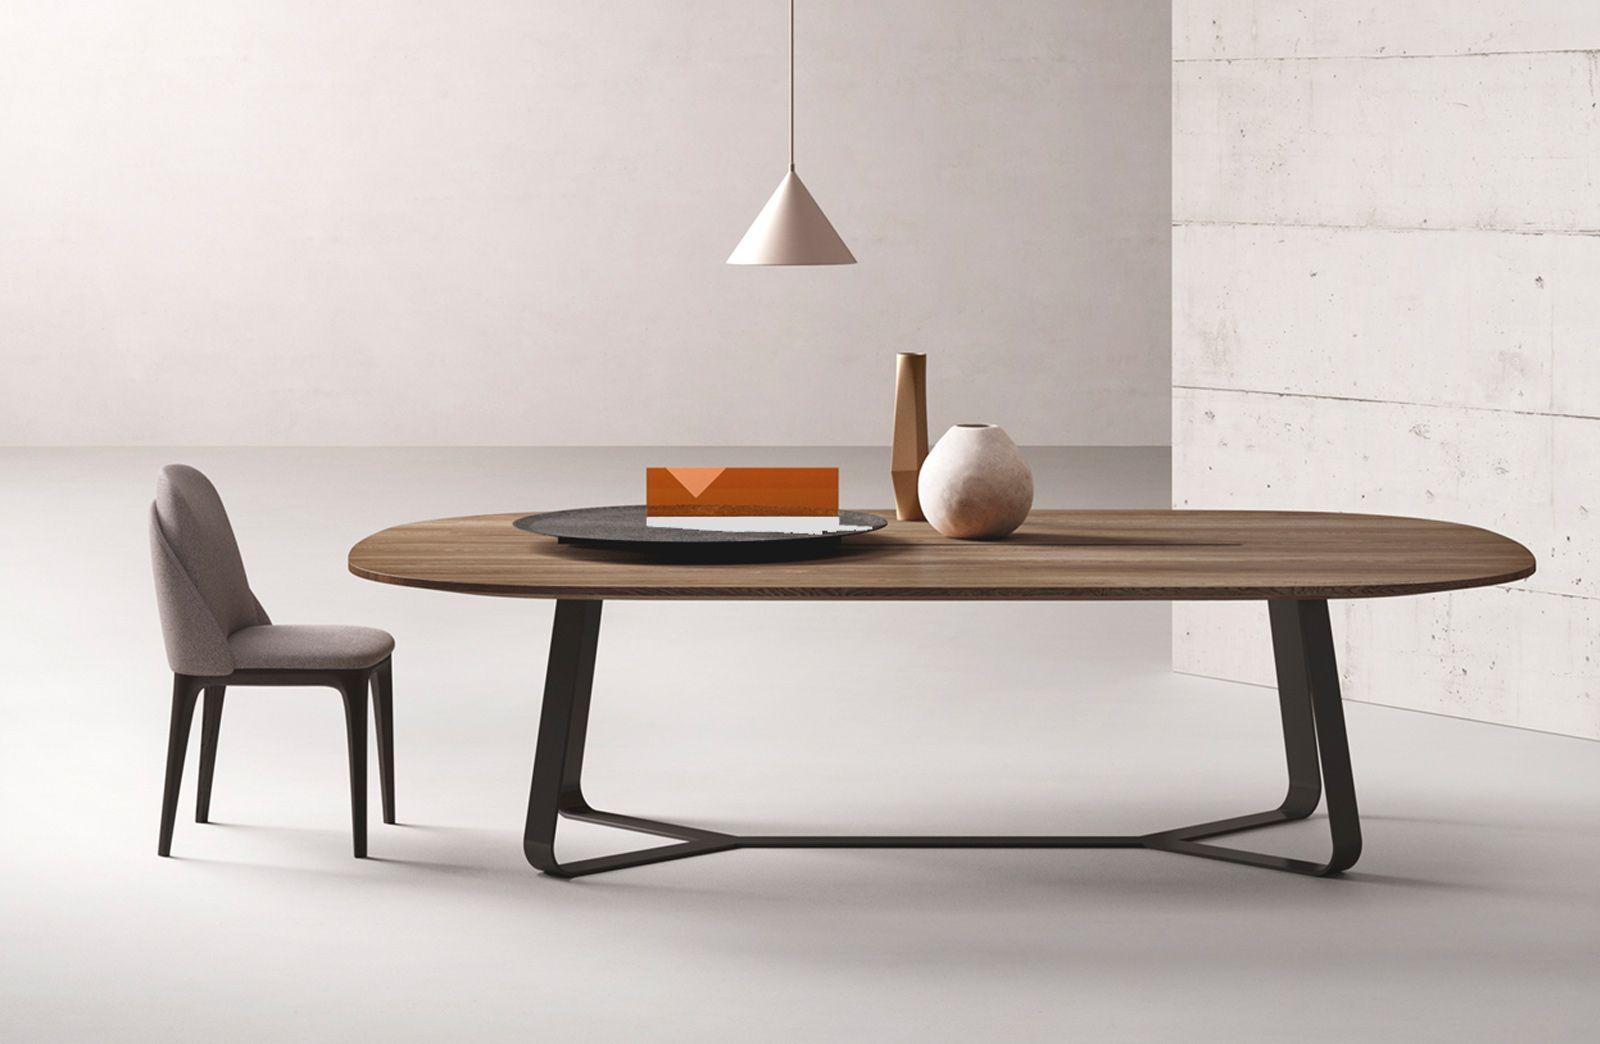 Contemporary Dining Tables Bespoke Designer Dining Tables Designed In Italy Wood Table Design Interior Design Dining Room Modern Dining Room Tables